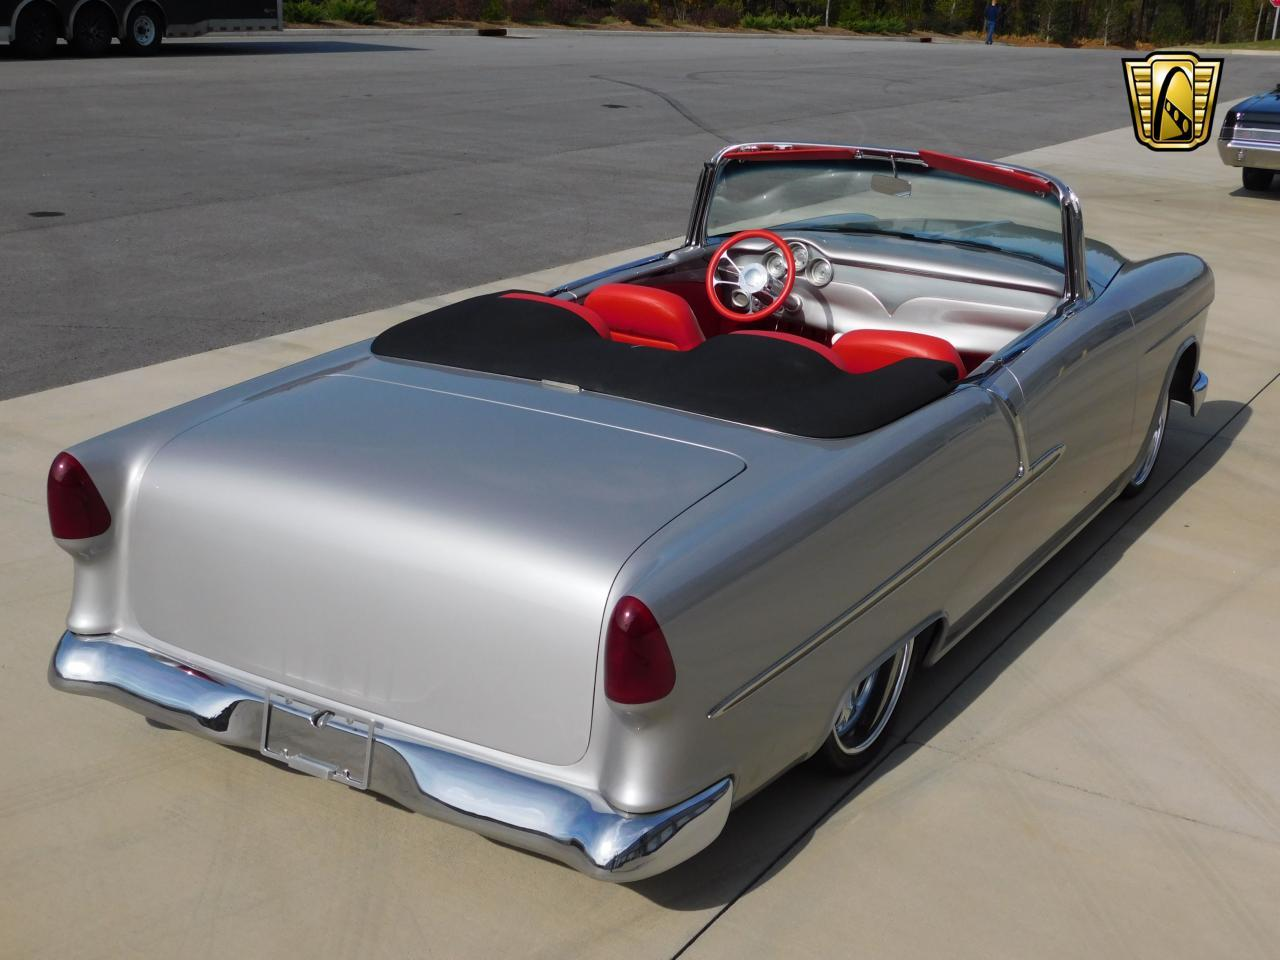 Large Picture of Classic 1955 Chevrolet Bel Air located in Alpharetta Georgia Offered by Gateway Classic Cars - Atlanta - MDI3